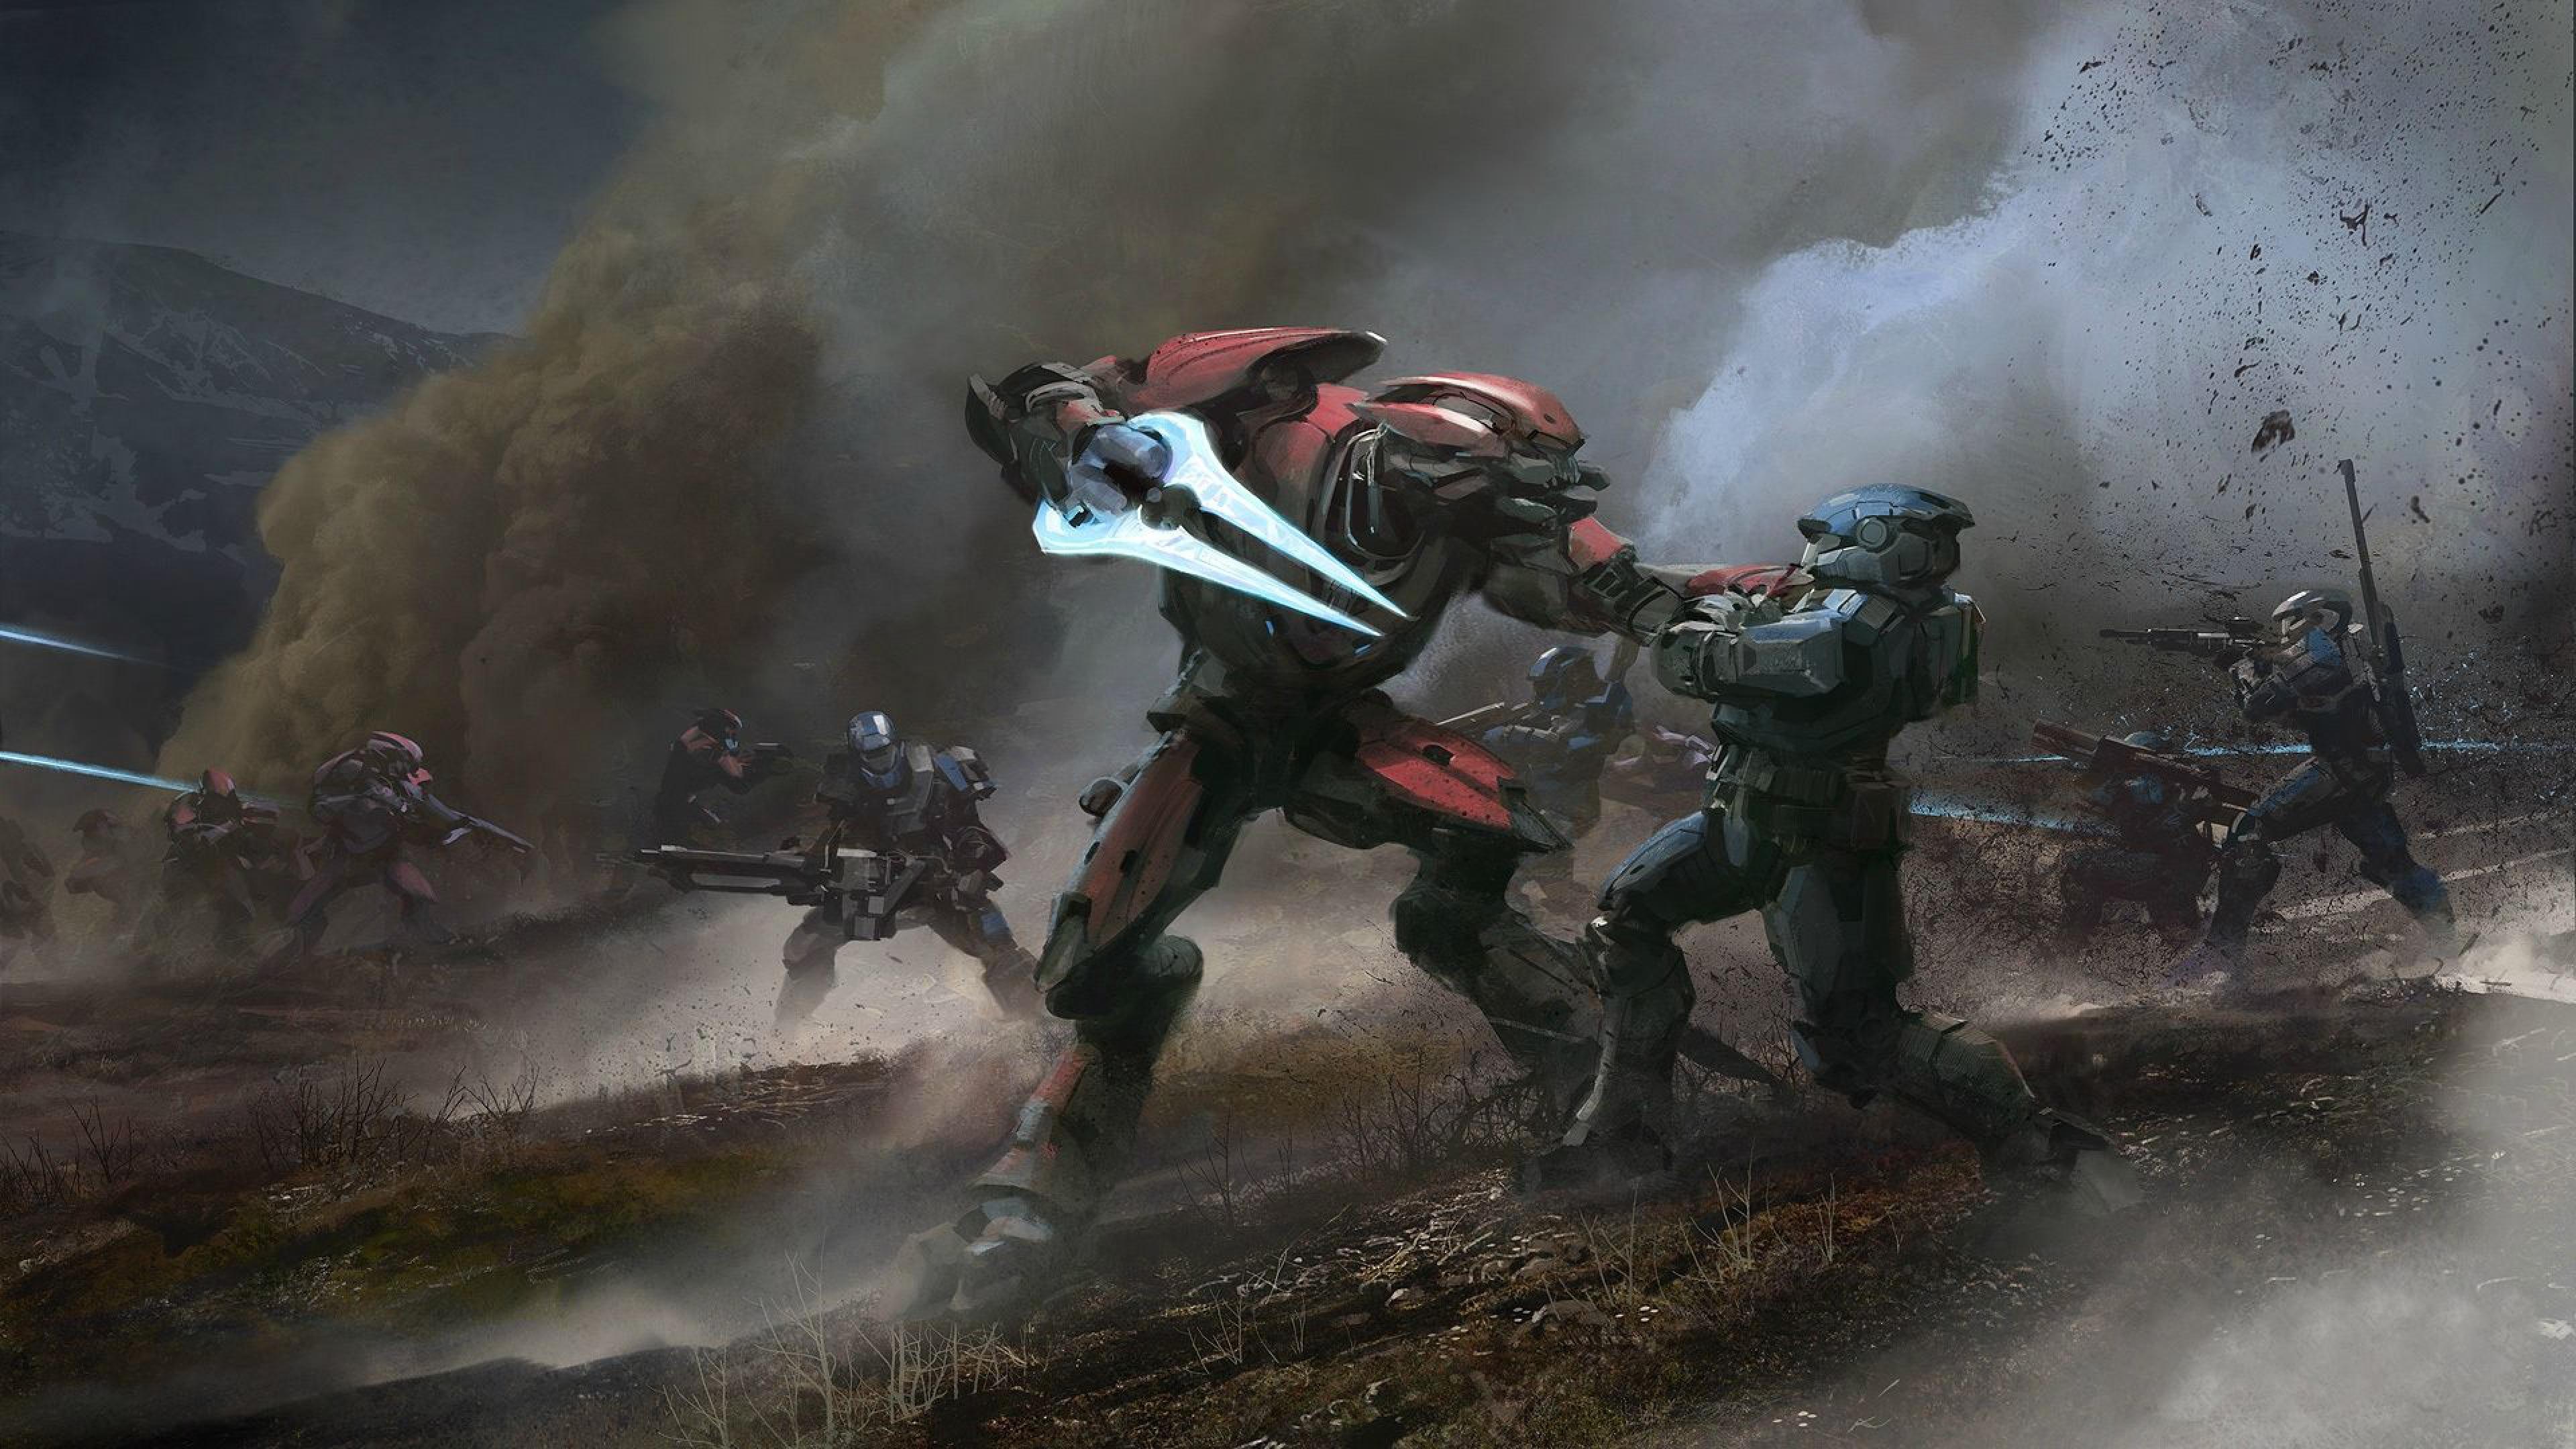 Halo Reach Elite Battle Spartan Wallpaper Background 4K Ultra HD 3840x2160